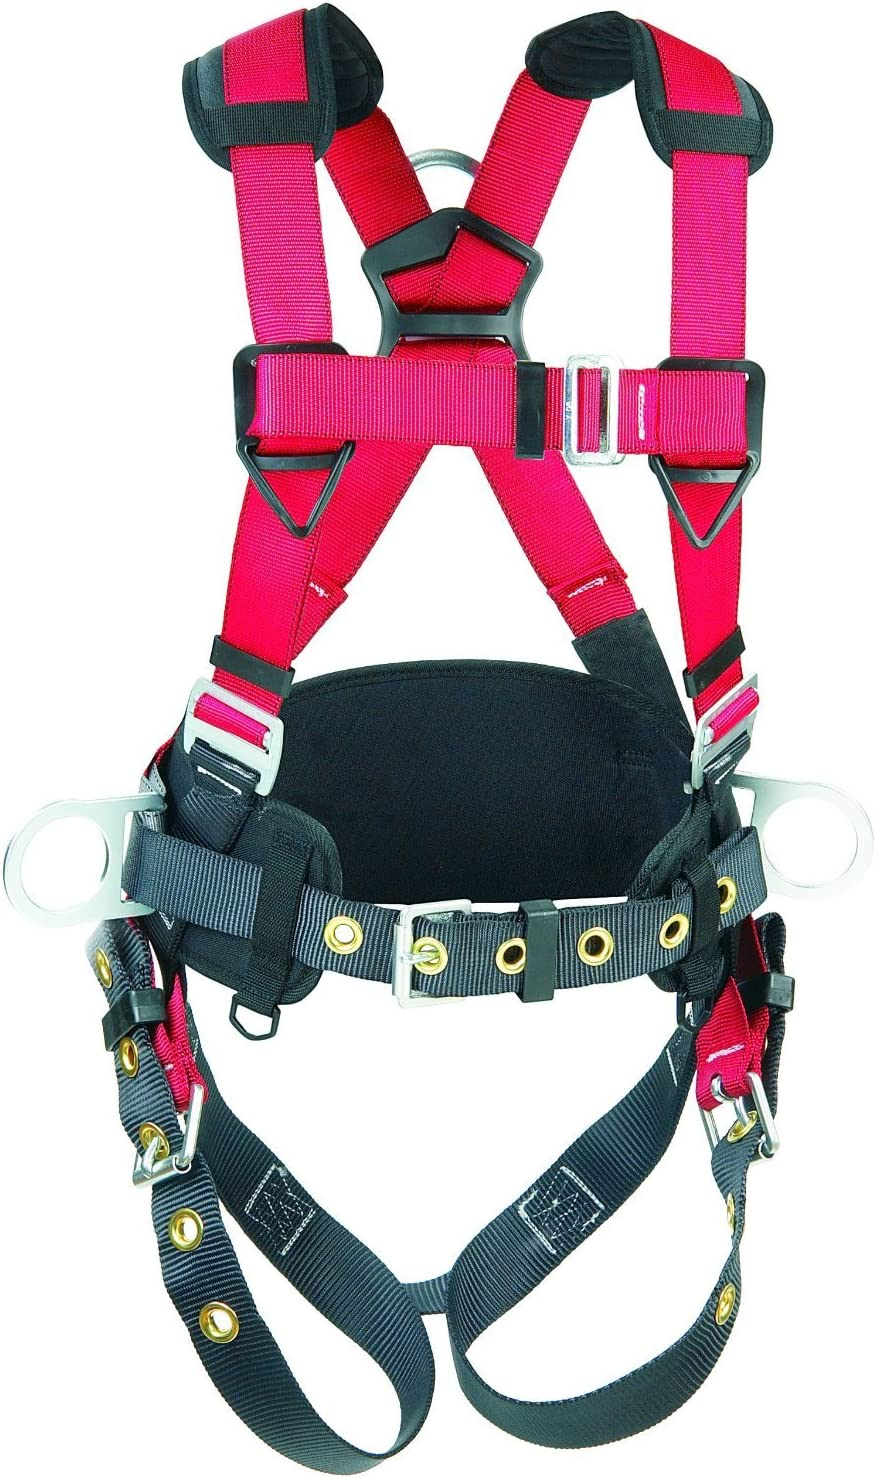 Full Body Harness Red//Gray 420 lb S